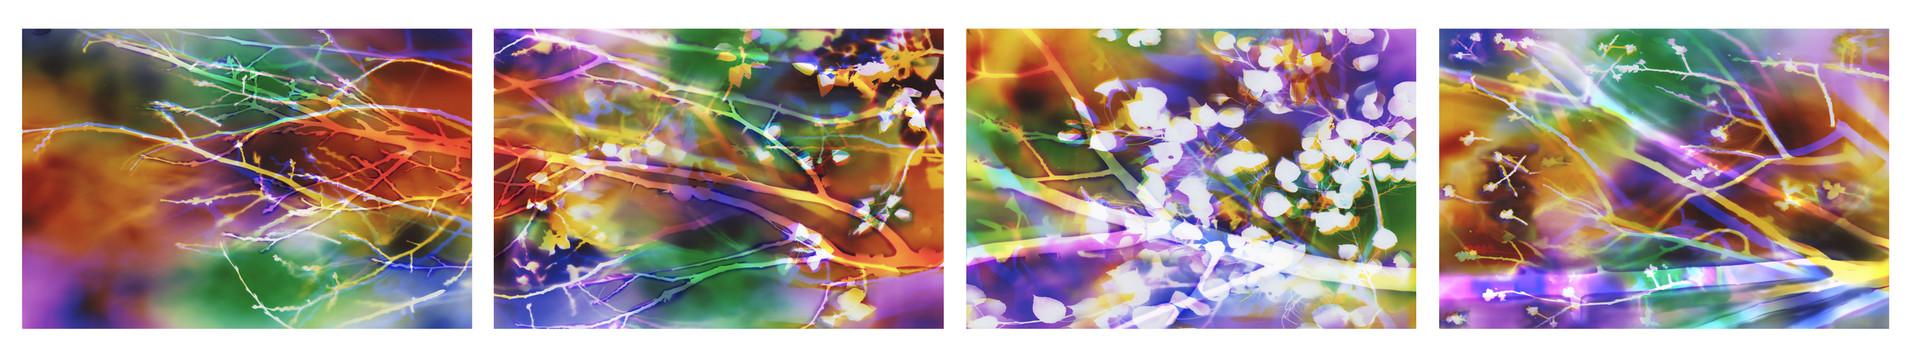 "Inspired by Nature: Seasons, 40"" x 240"" (4 40"" x 60"" panels), Commission by Utah Public Art Program, Installed in Noorda School of Dentistry at University of Utah, Salt Lake City, UT"